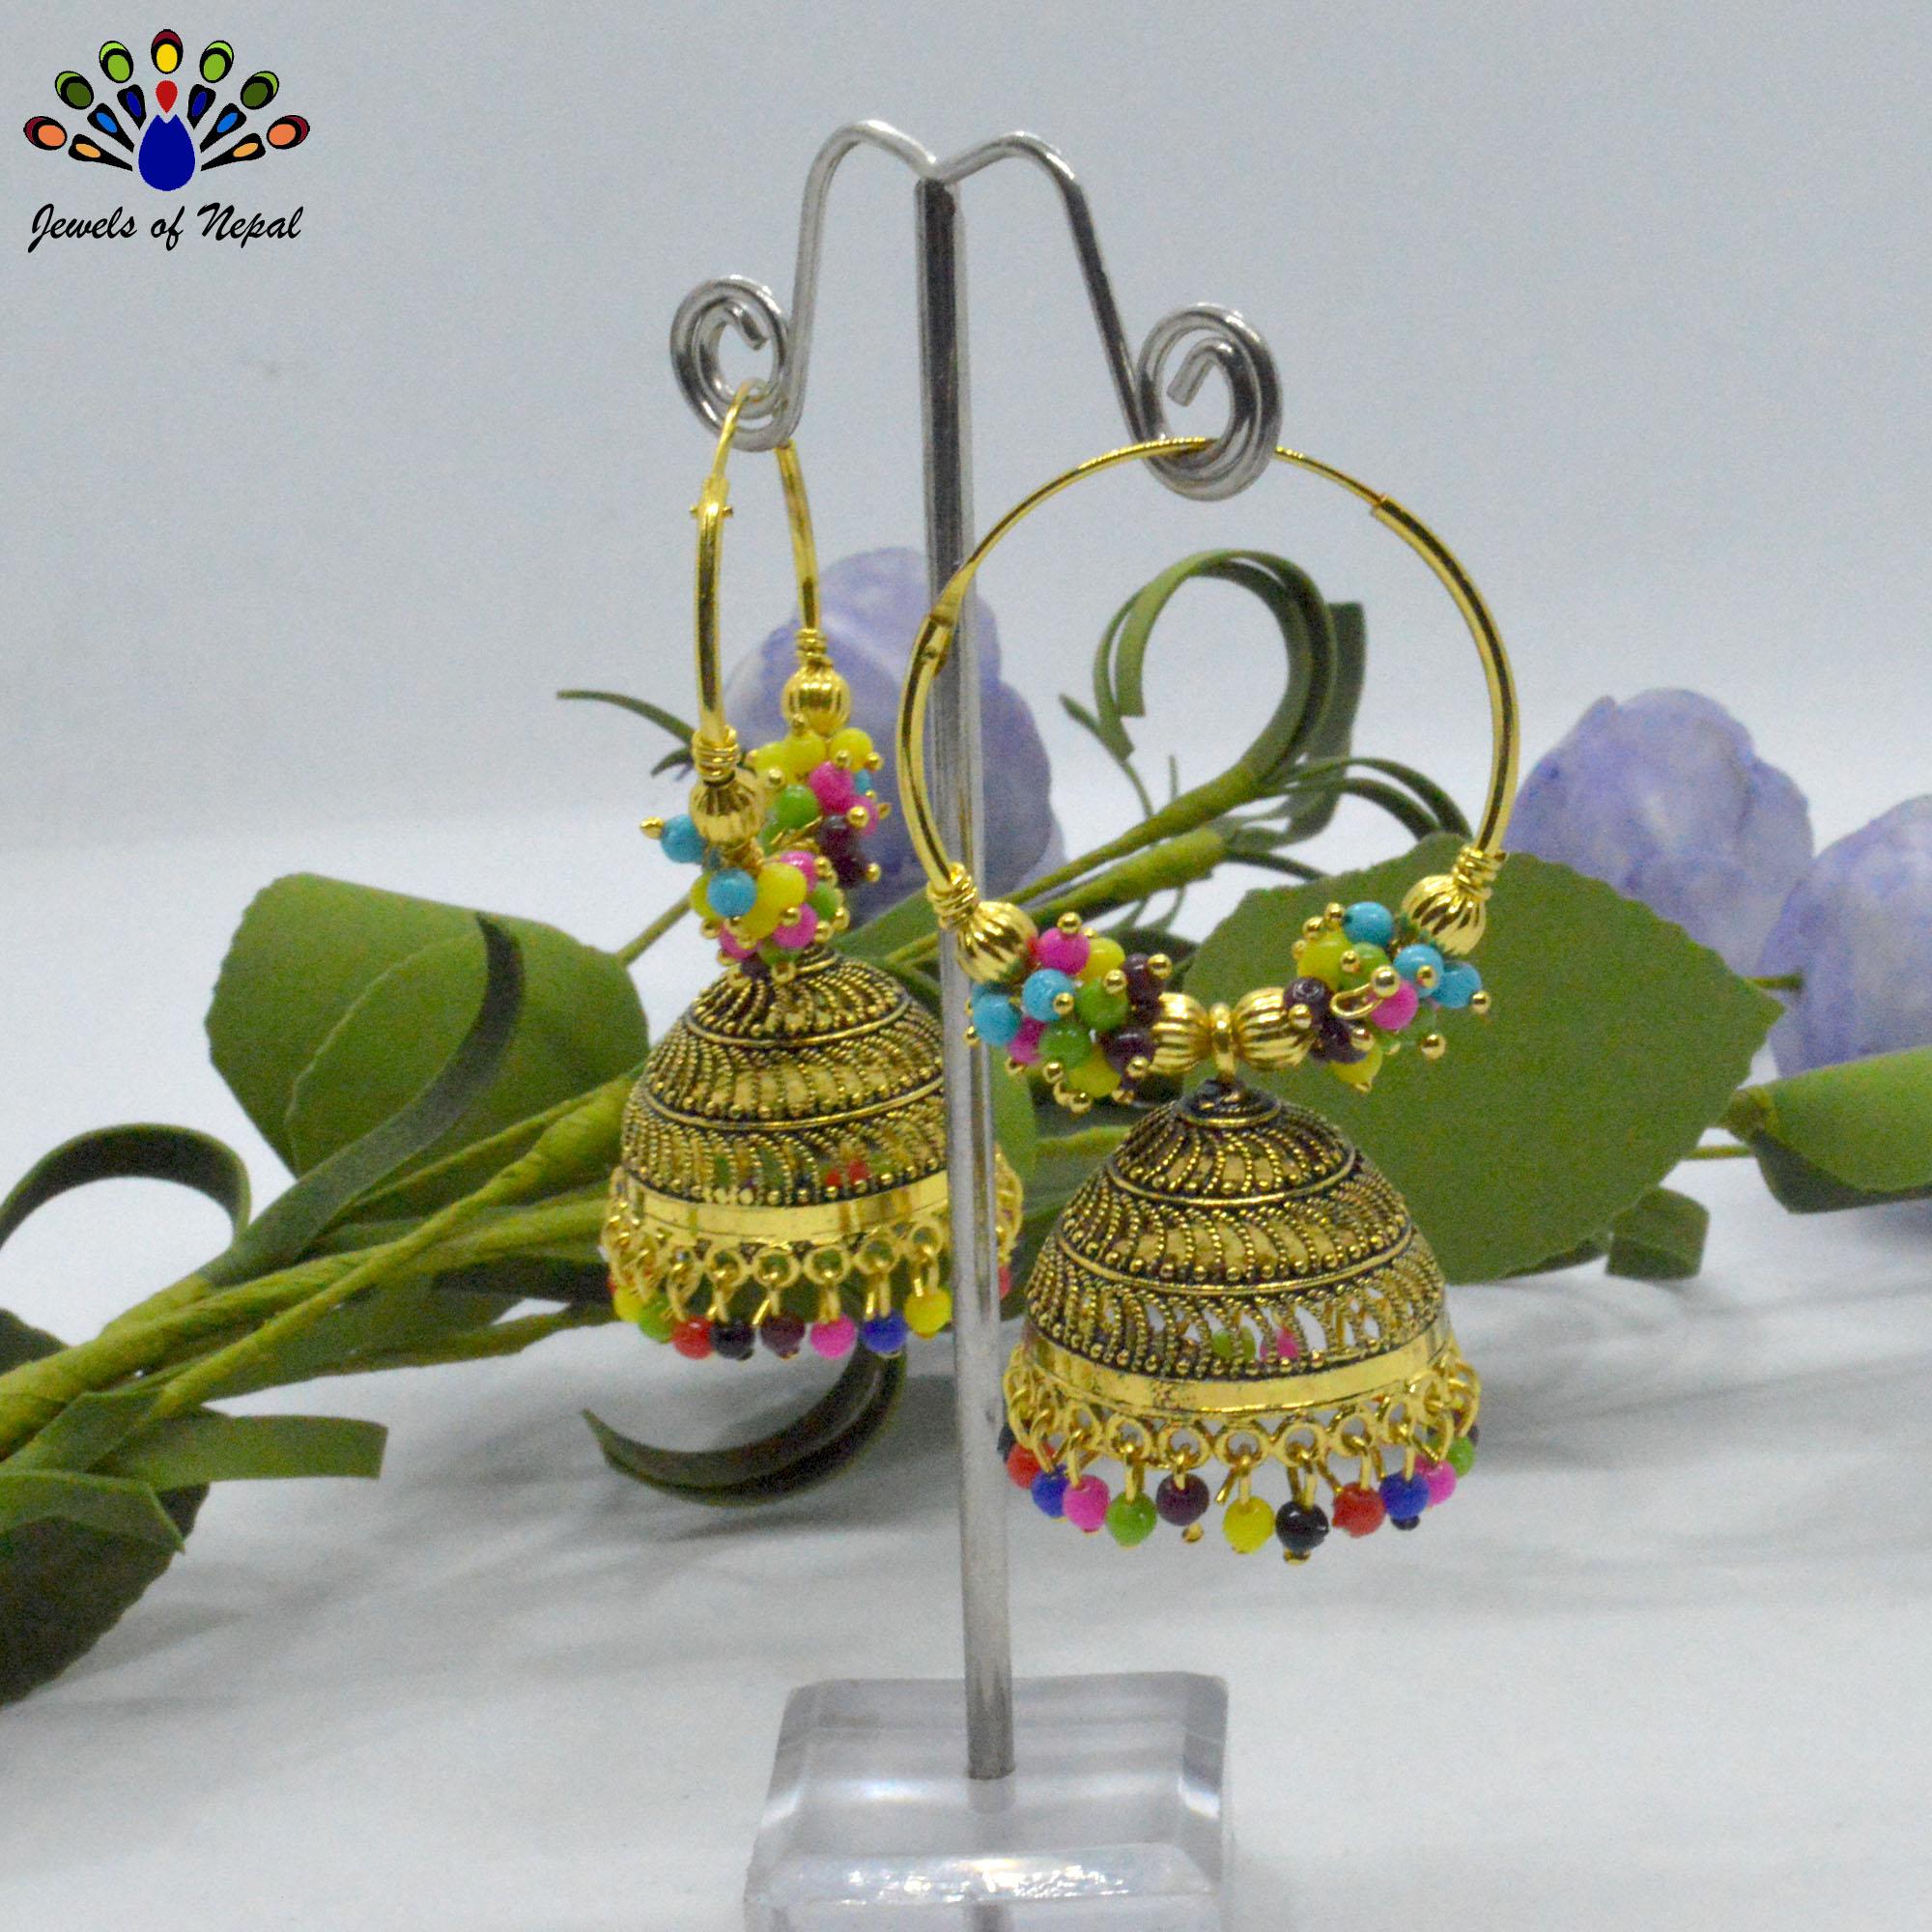 Golden/Multicolored Loop Pinjada Earrings